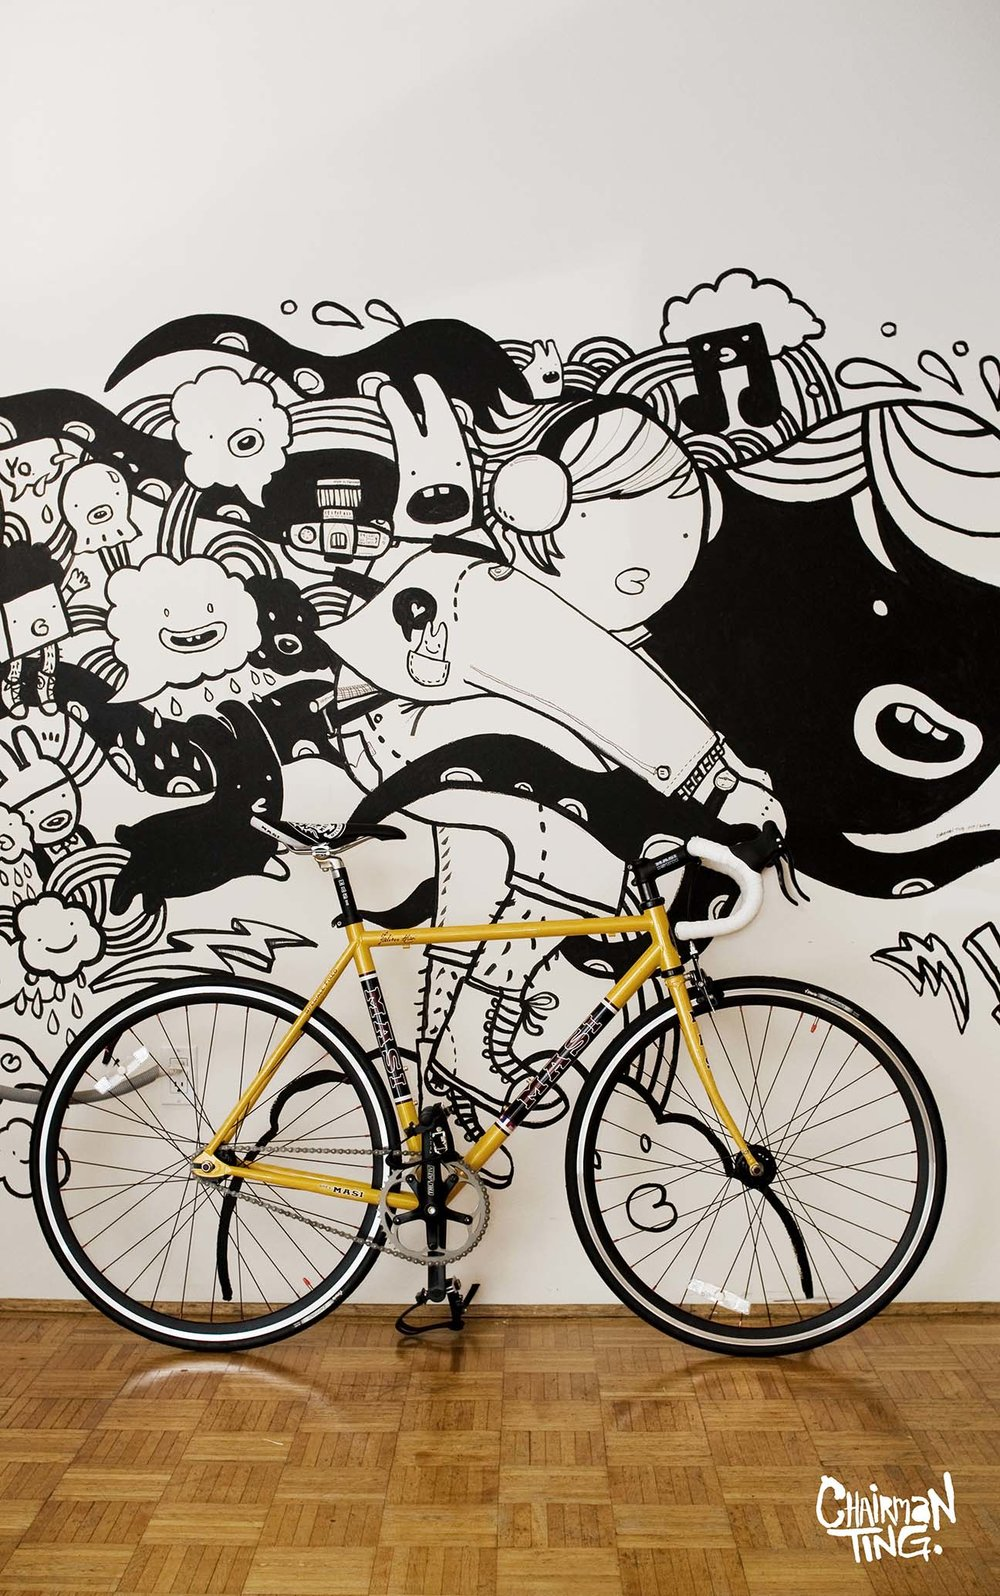 BikewallArt_TING-1296px.jpg